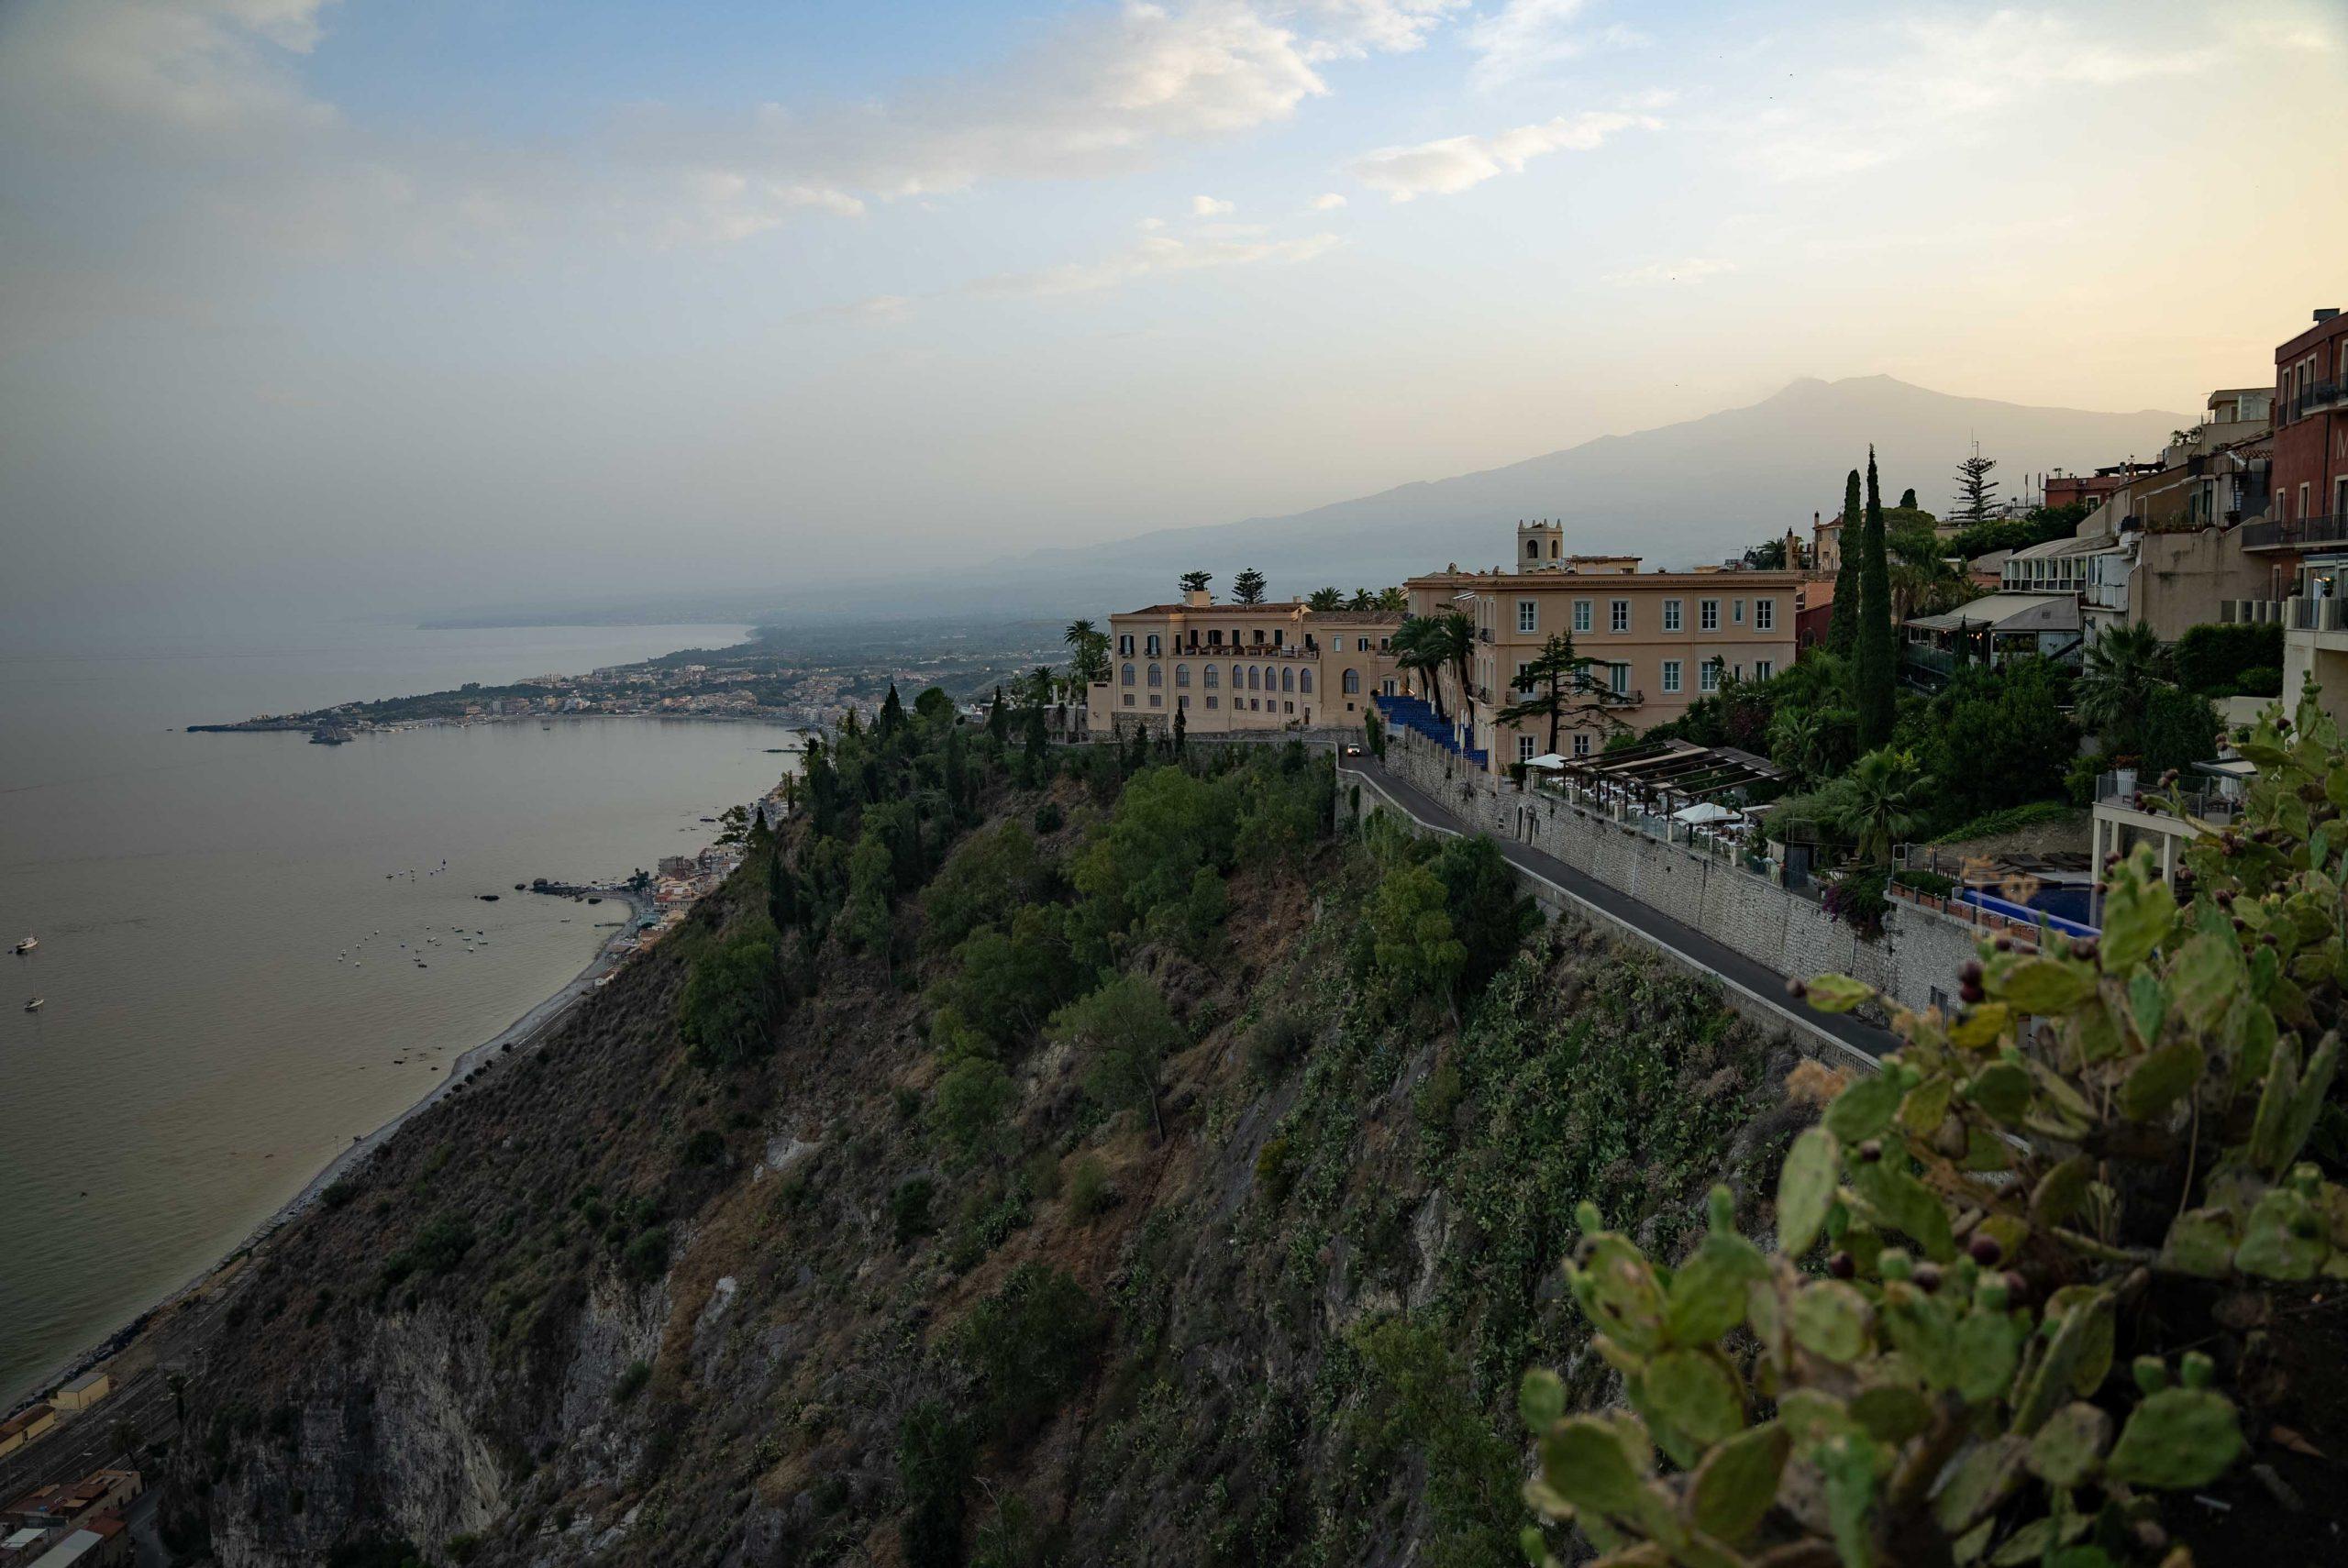 Land_Rover_Tour_Sicilia_2021_Land_Rover_Experience_Italia_-134